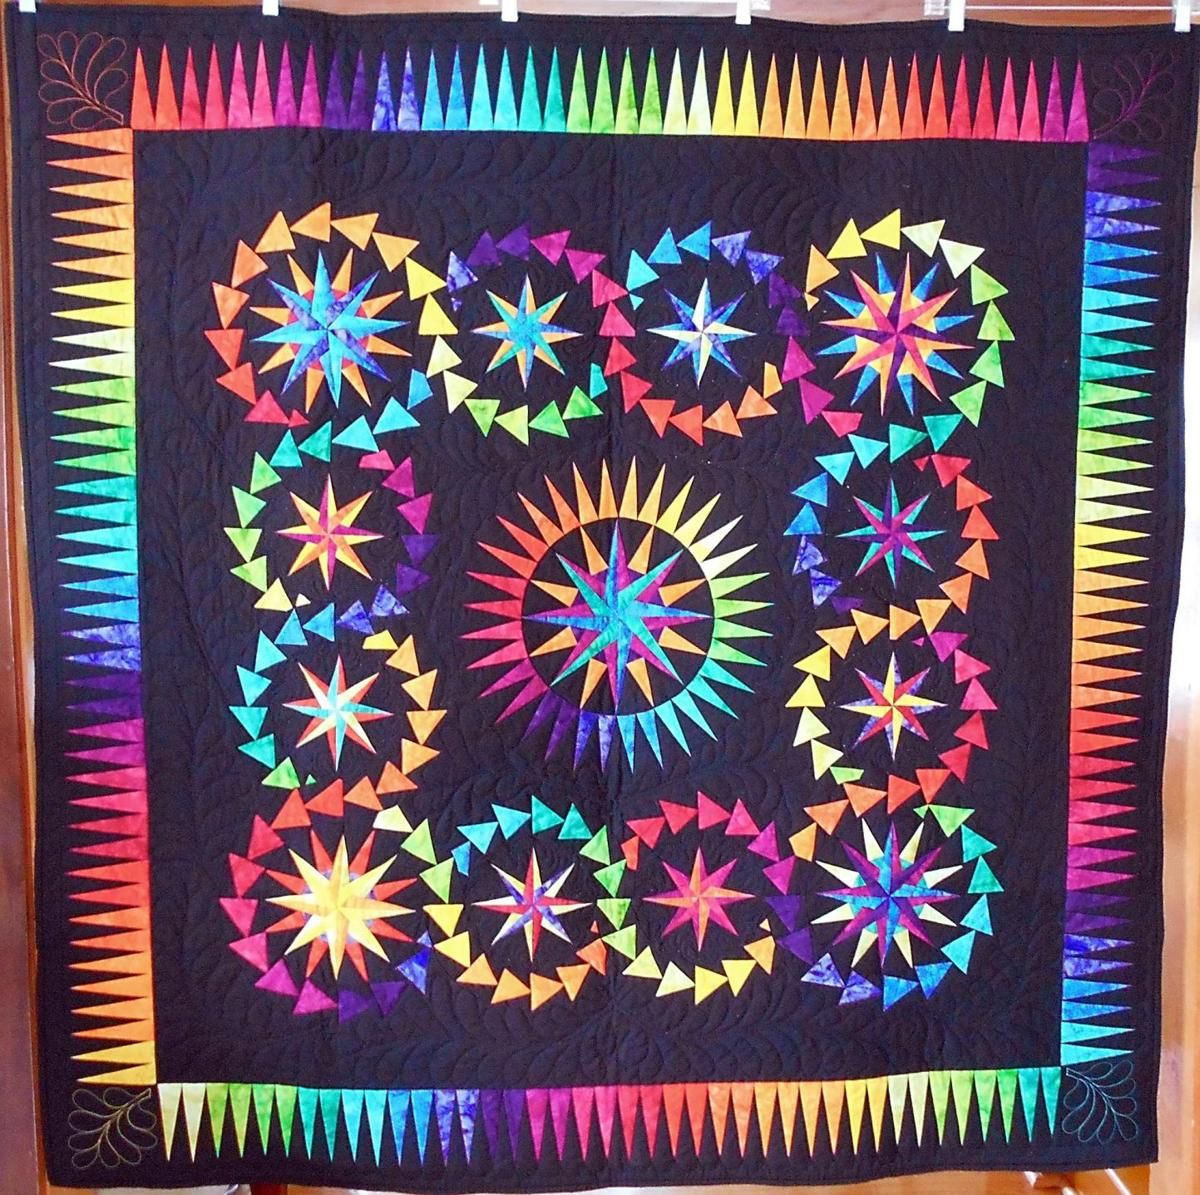 Mike Ellingsen quilt